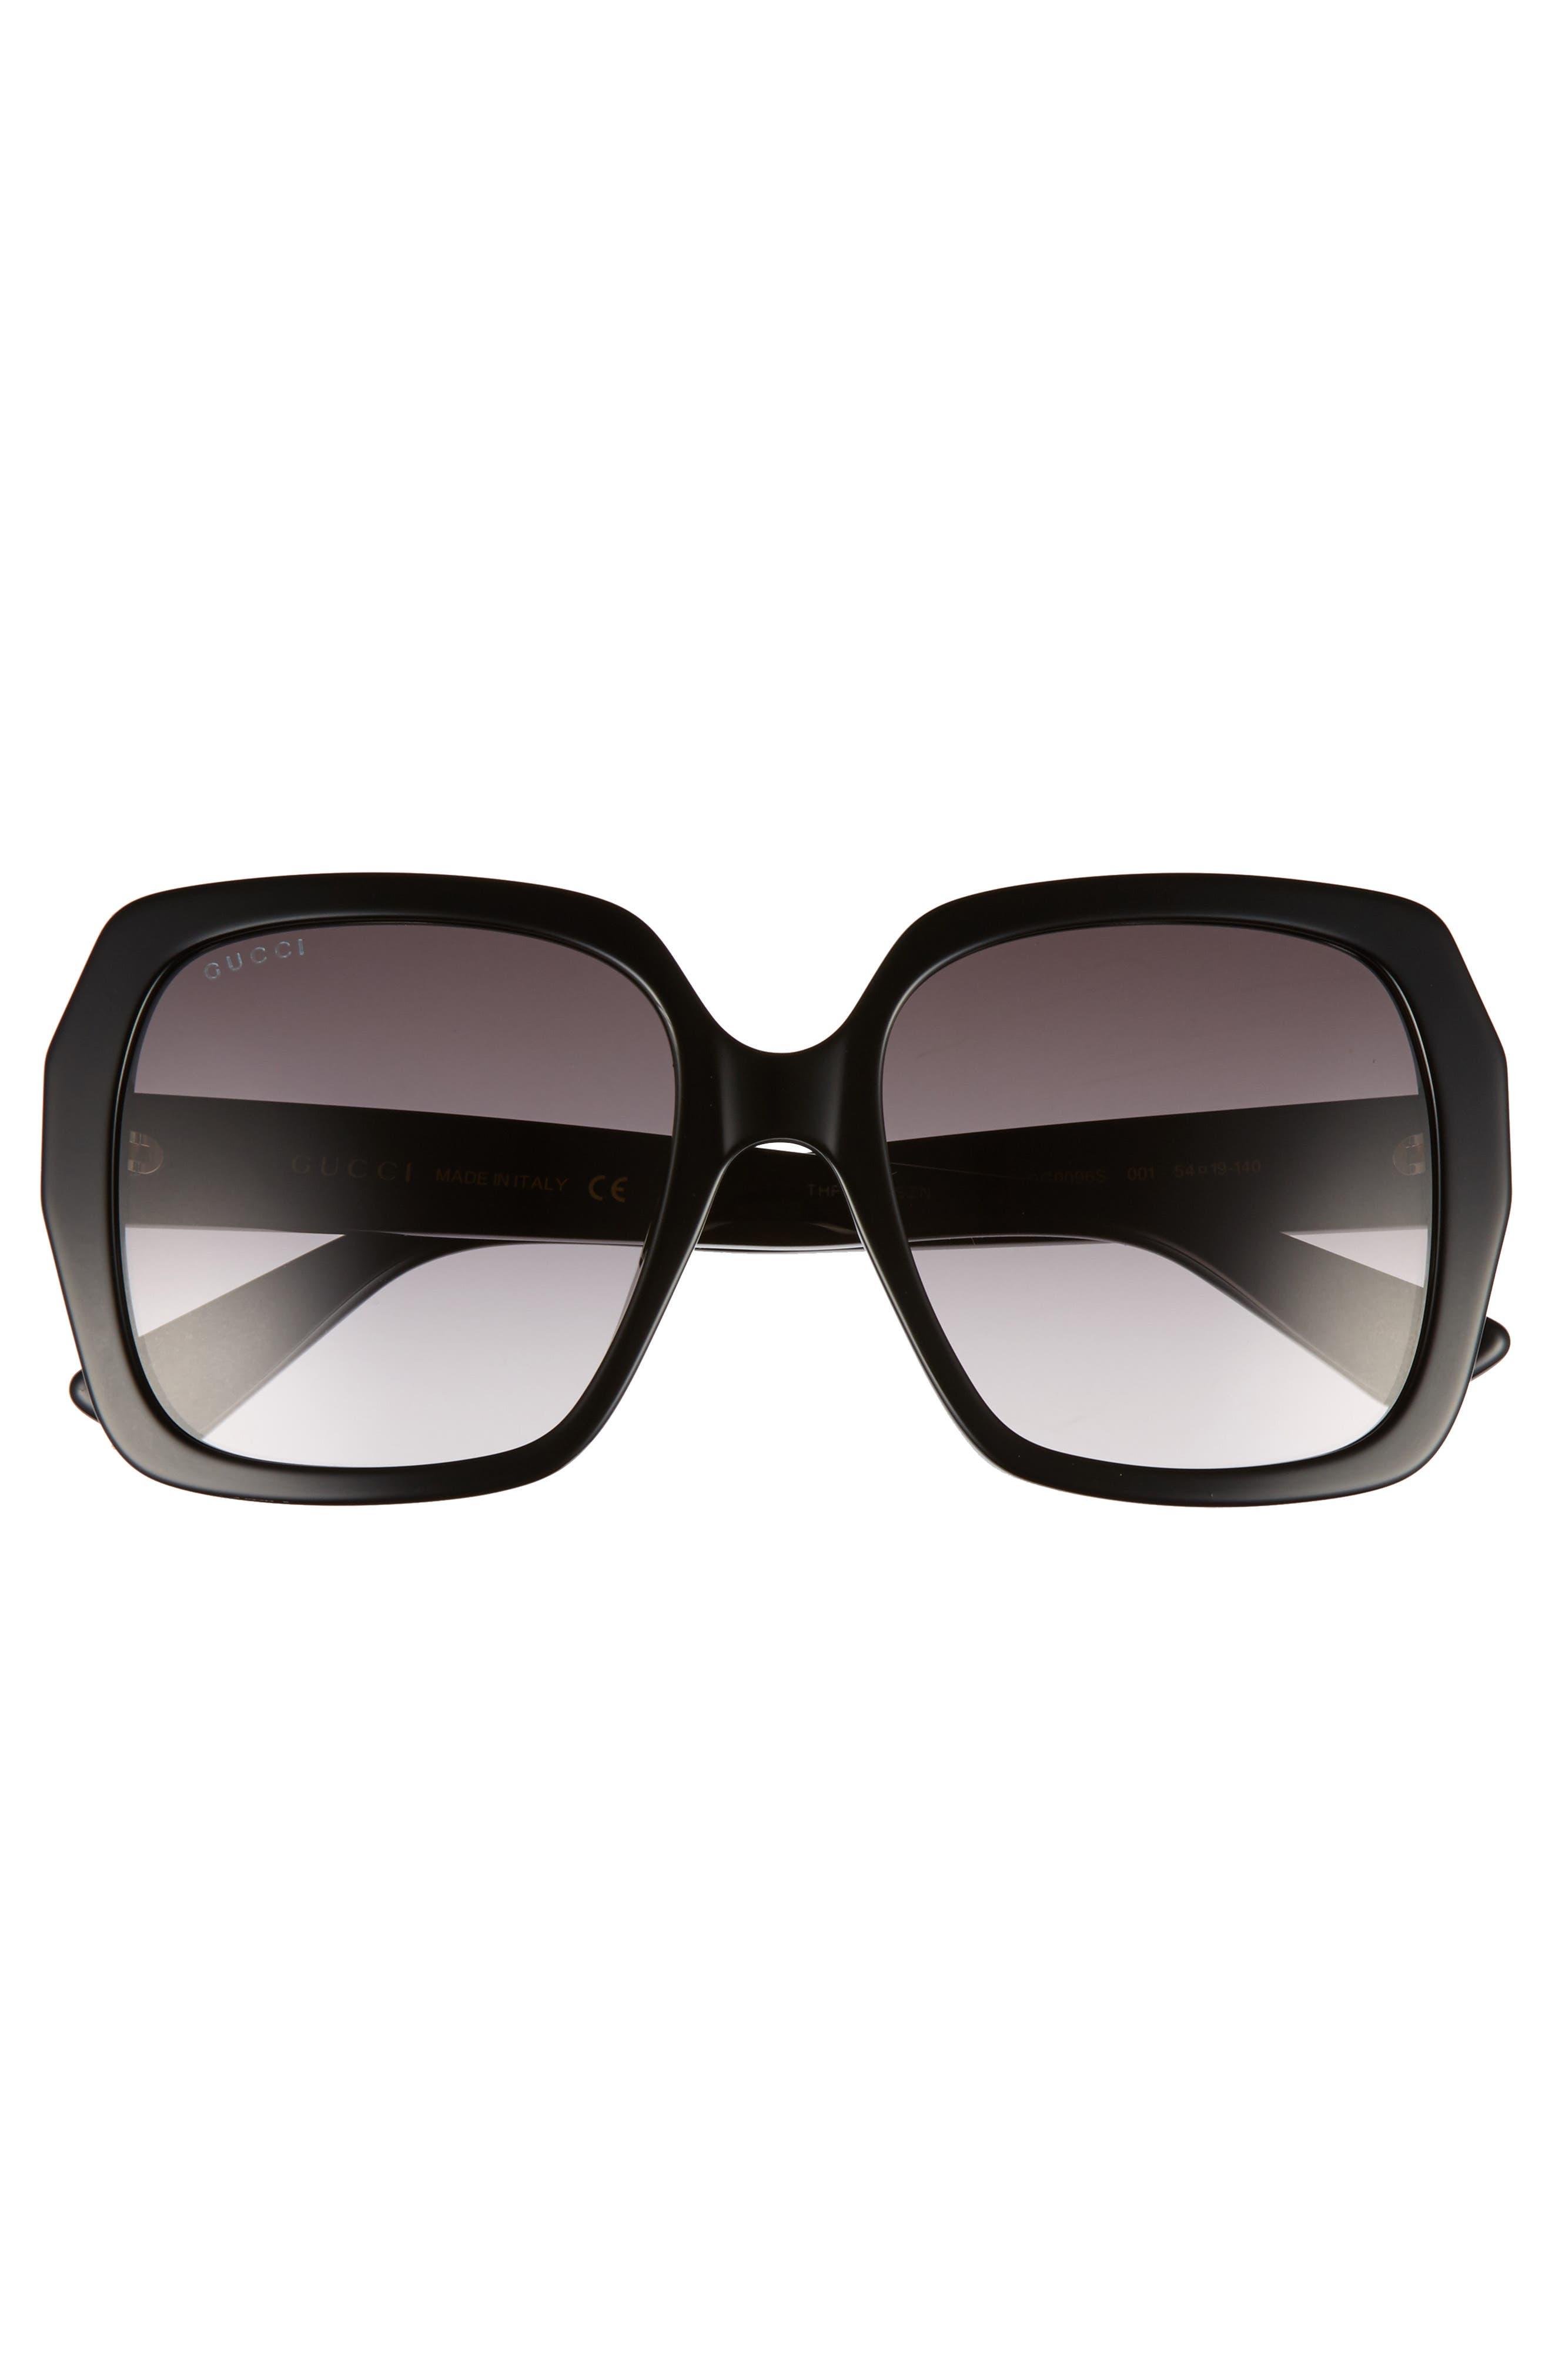 54mm Gradient Square Sunglasses,                             Alternate thumbnail 3, color,                             001